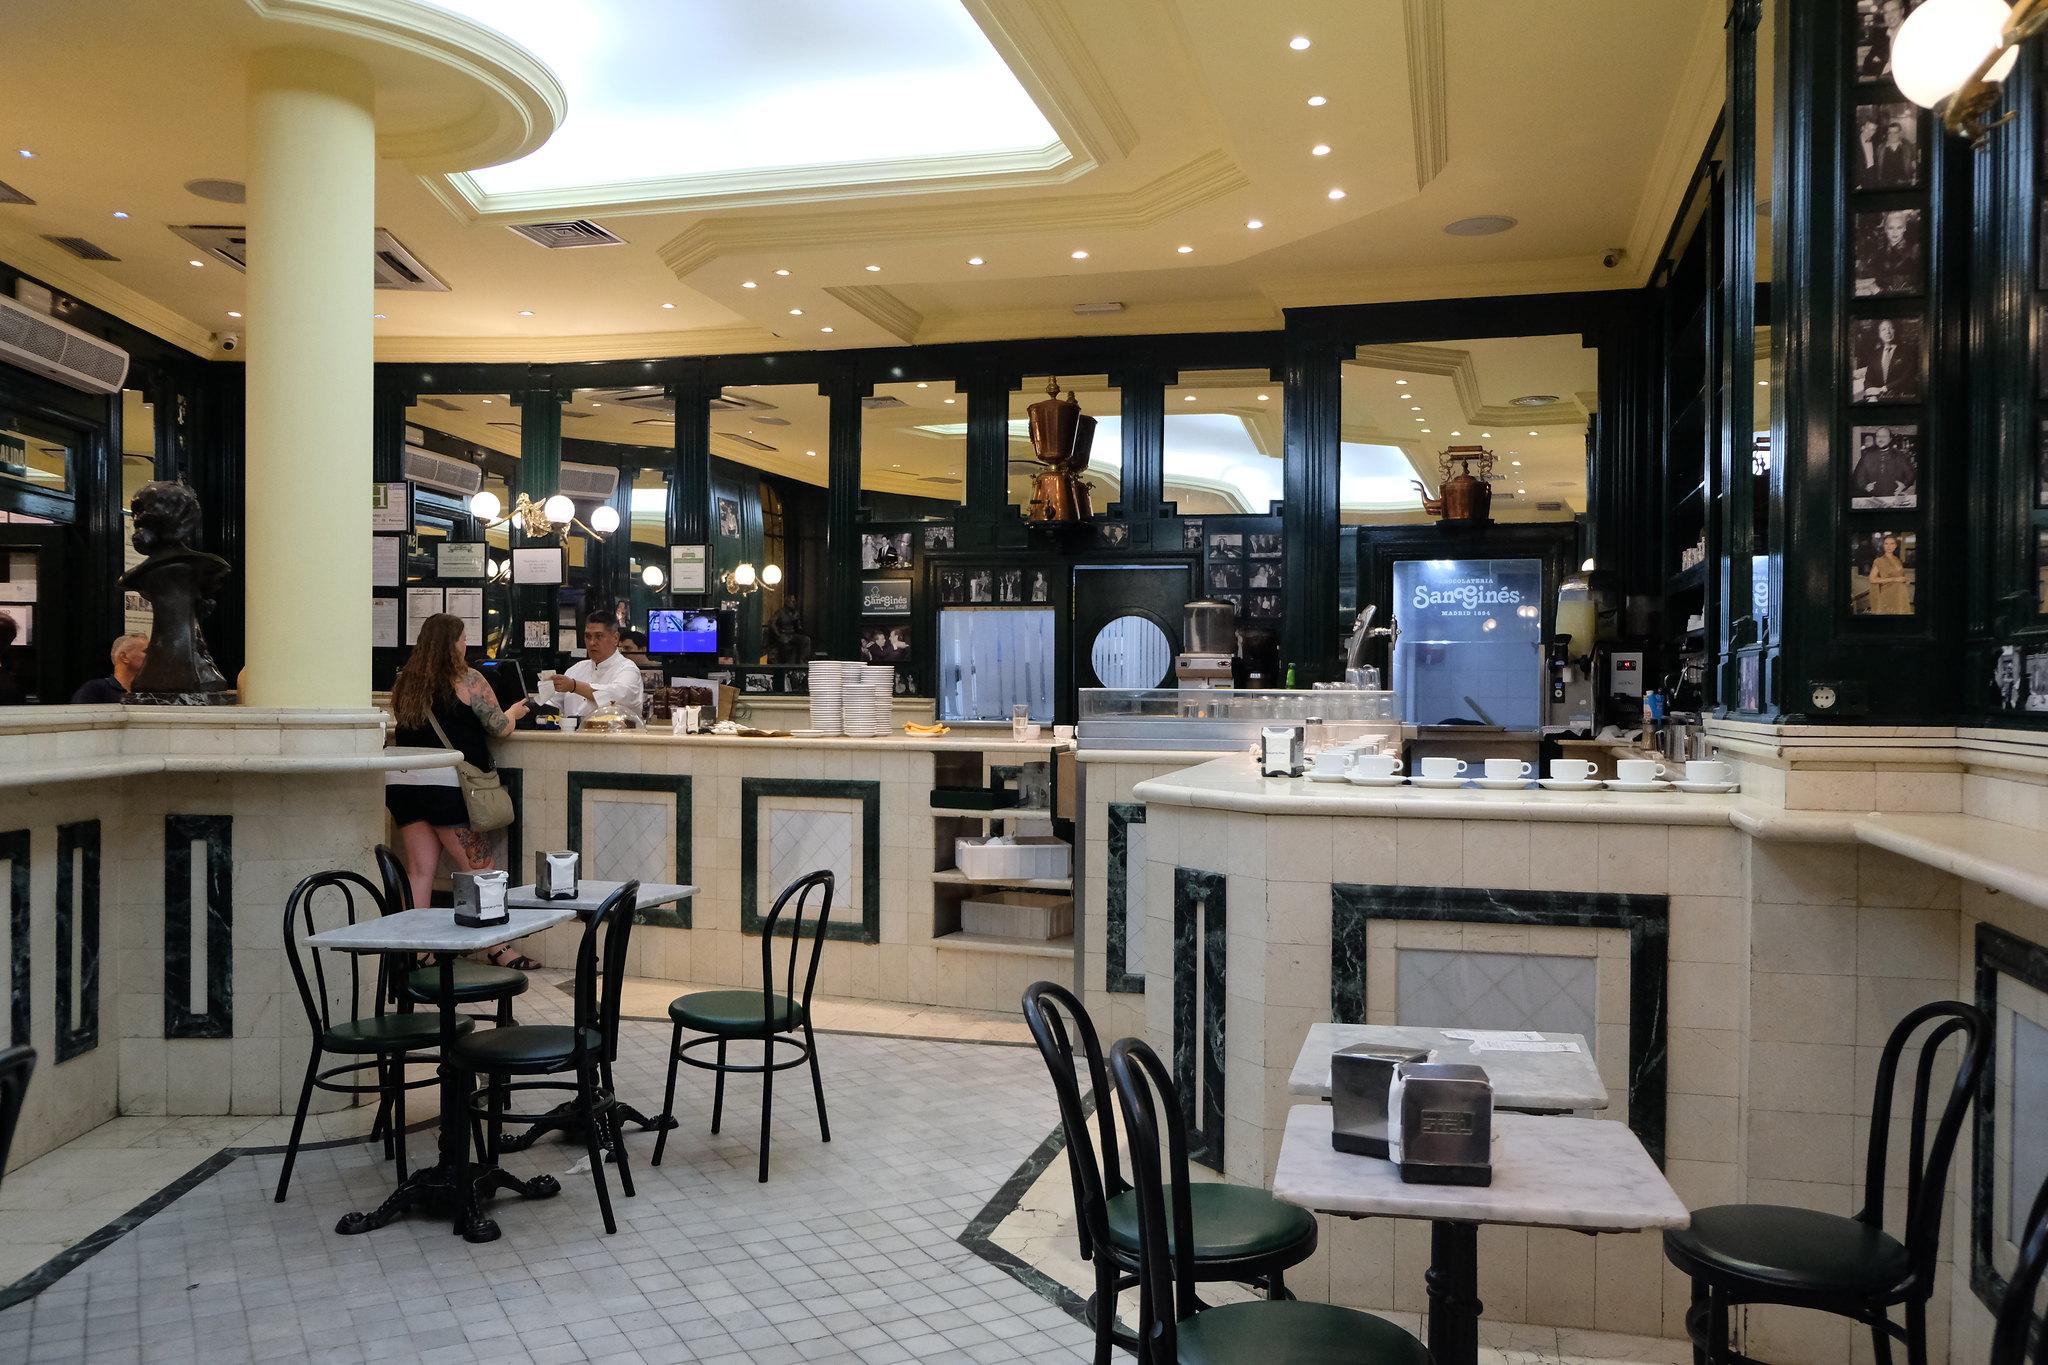 Chocolateria san Gines | Tapas in Madrid